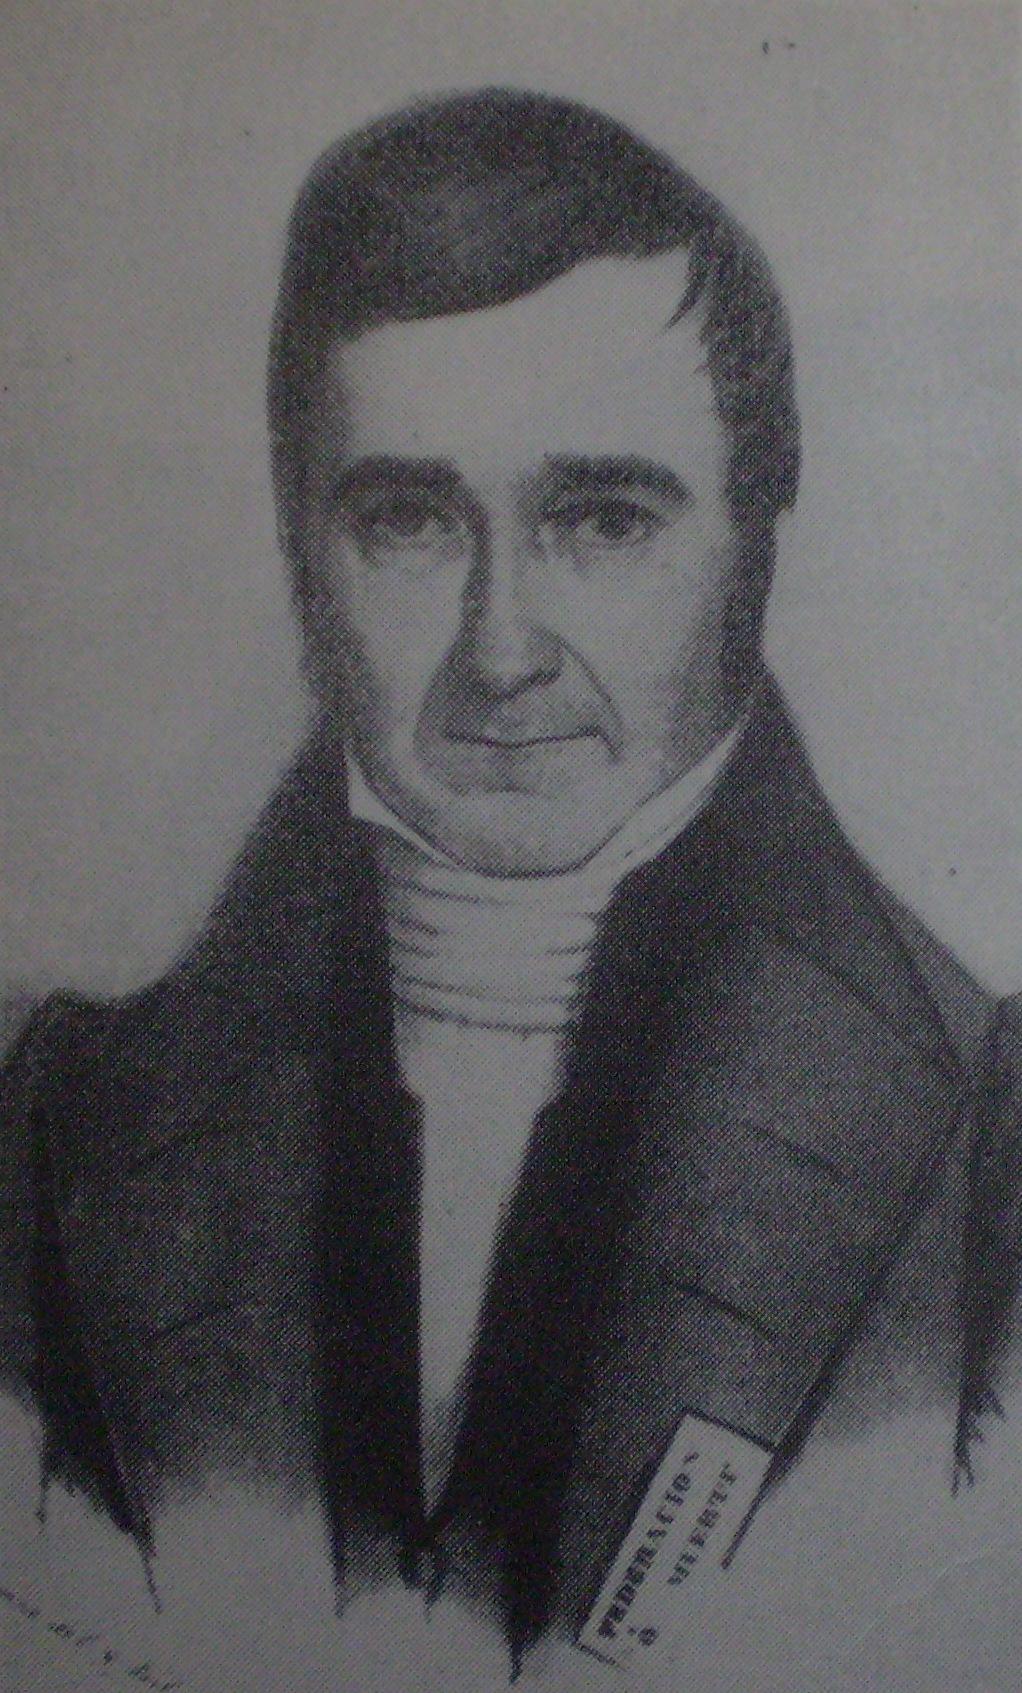 Depiction of Felipe Arana